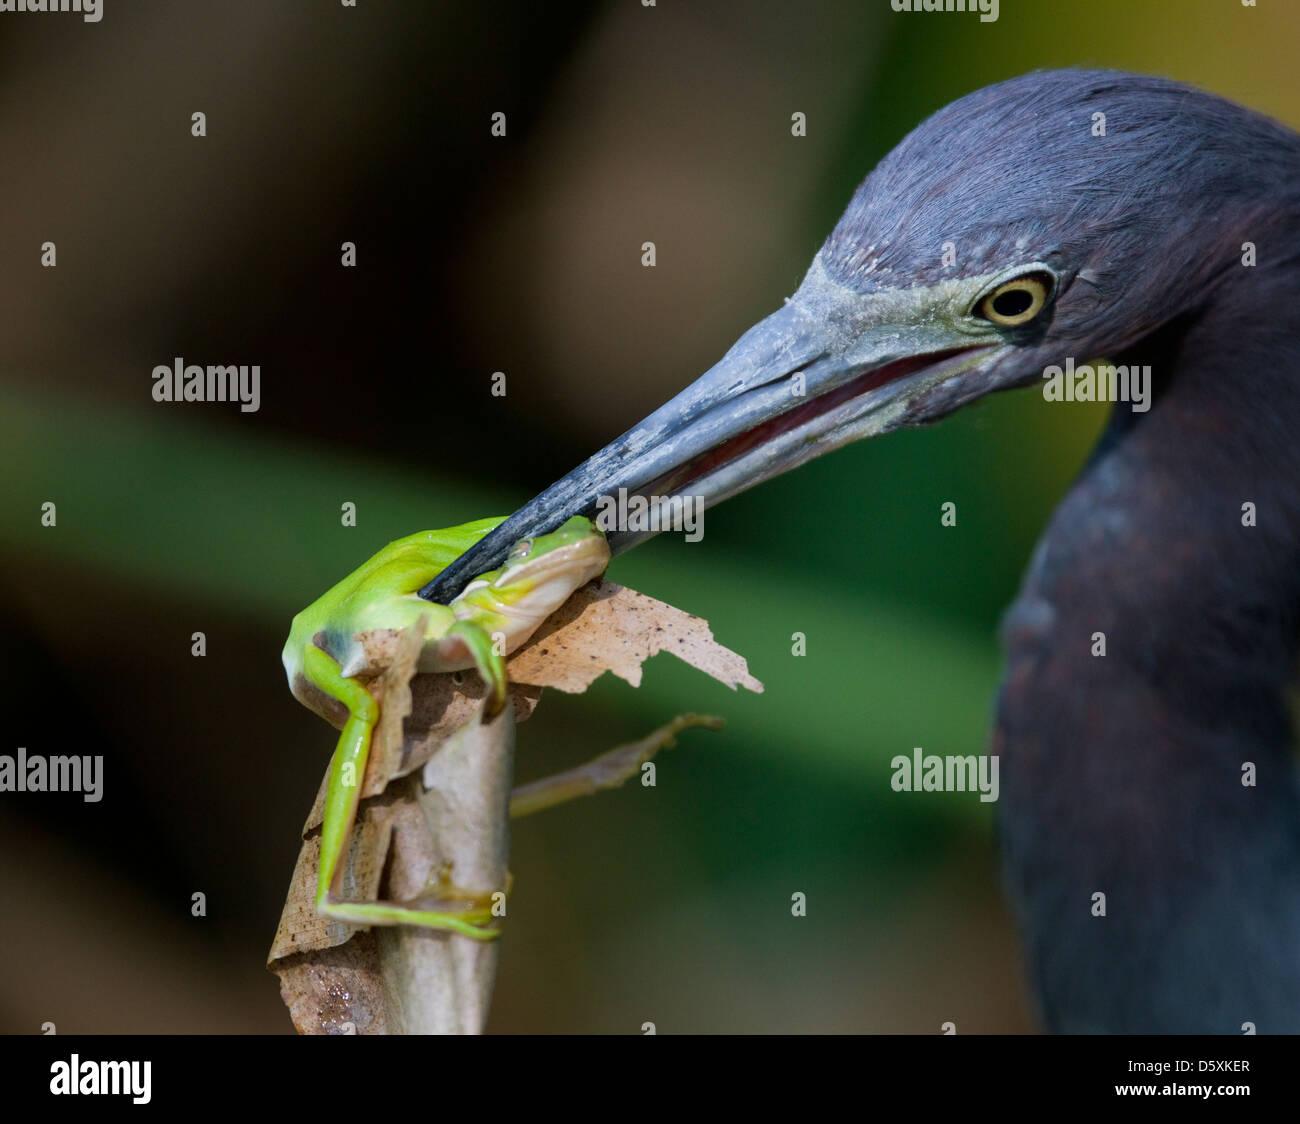 LITTLE BLUE HERON (Egretta caerulea) feeding on GREEN TREE FROG (Hyla cinerea),  Corkscrew Swamp Audubon Sanctuary, - Stock Image